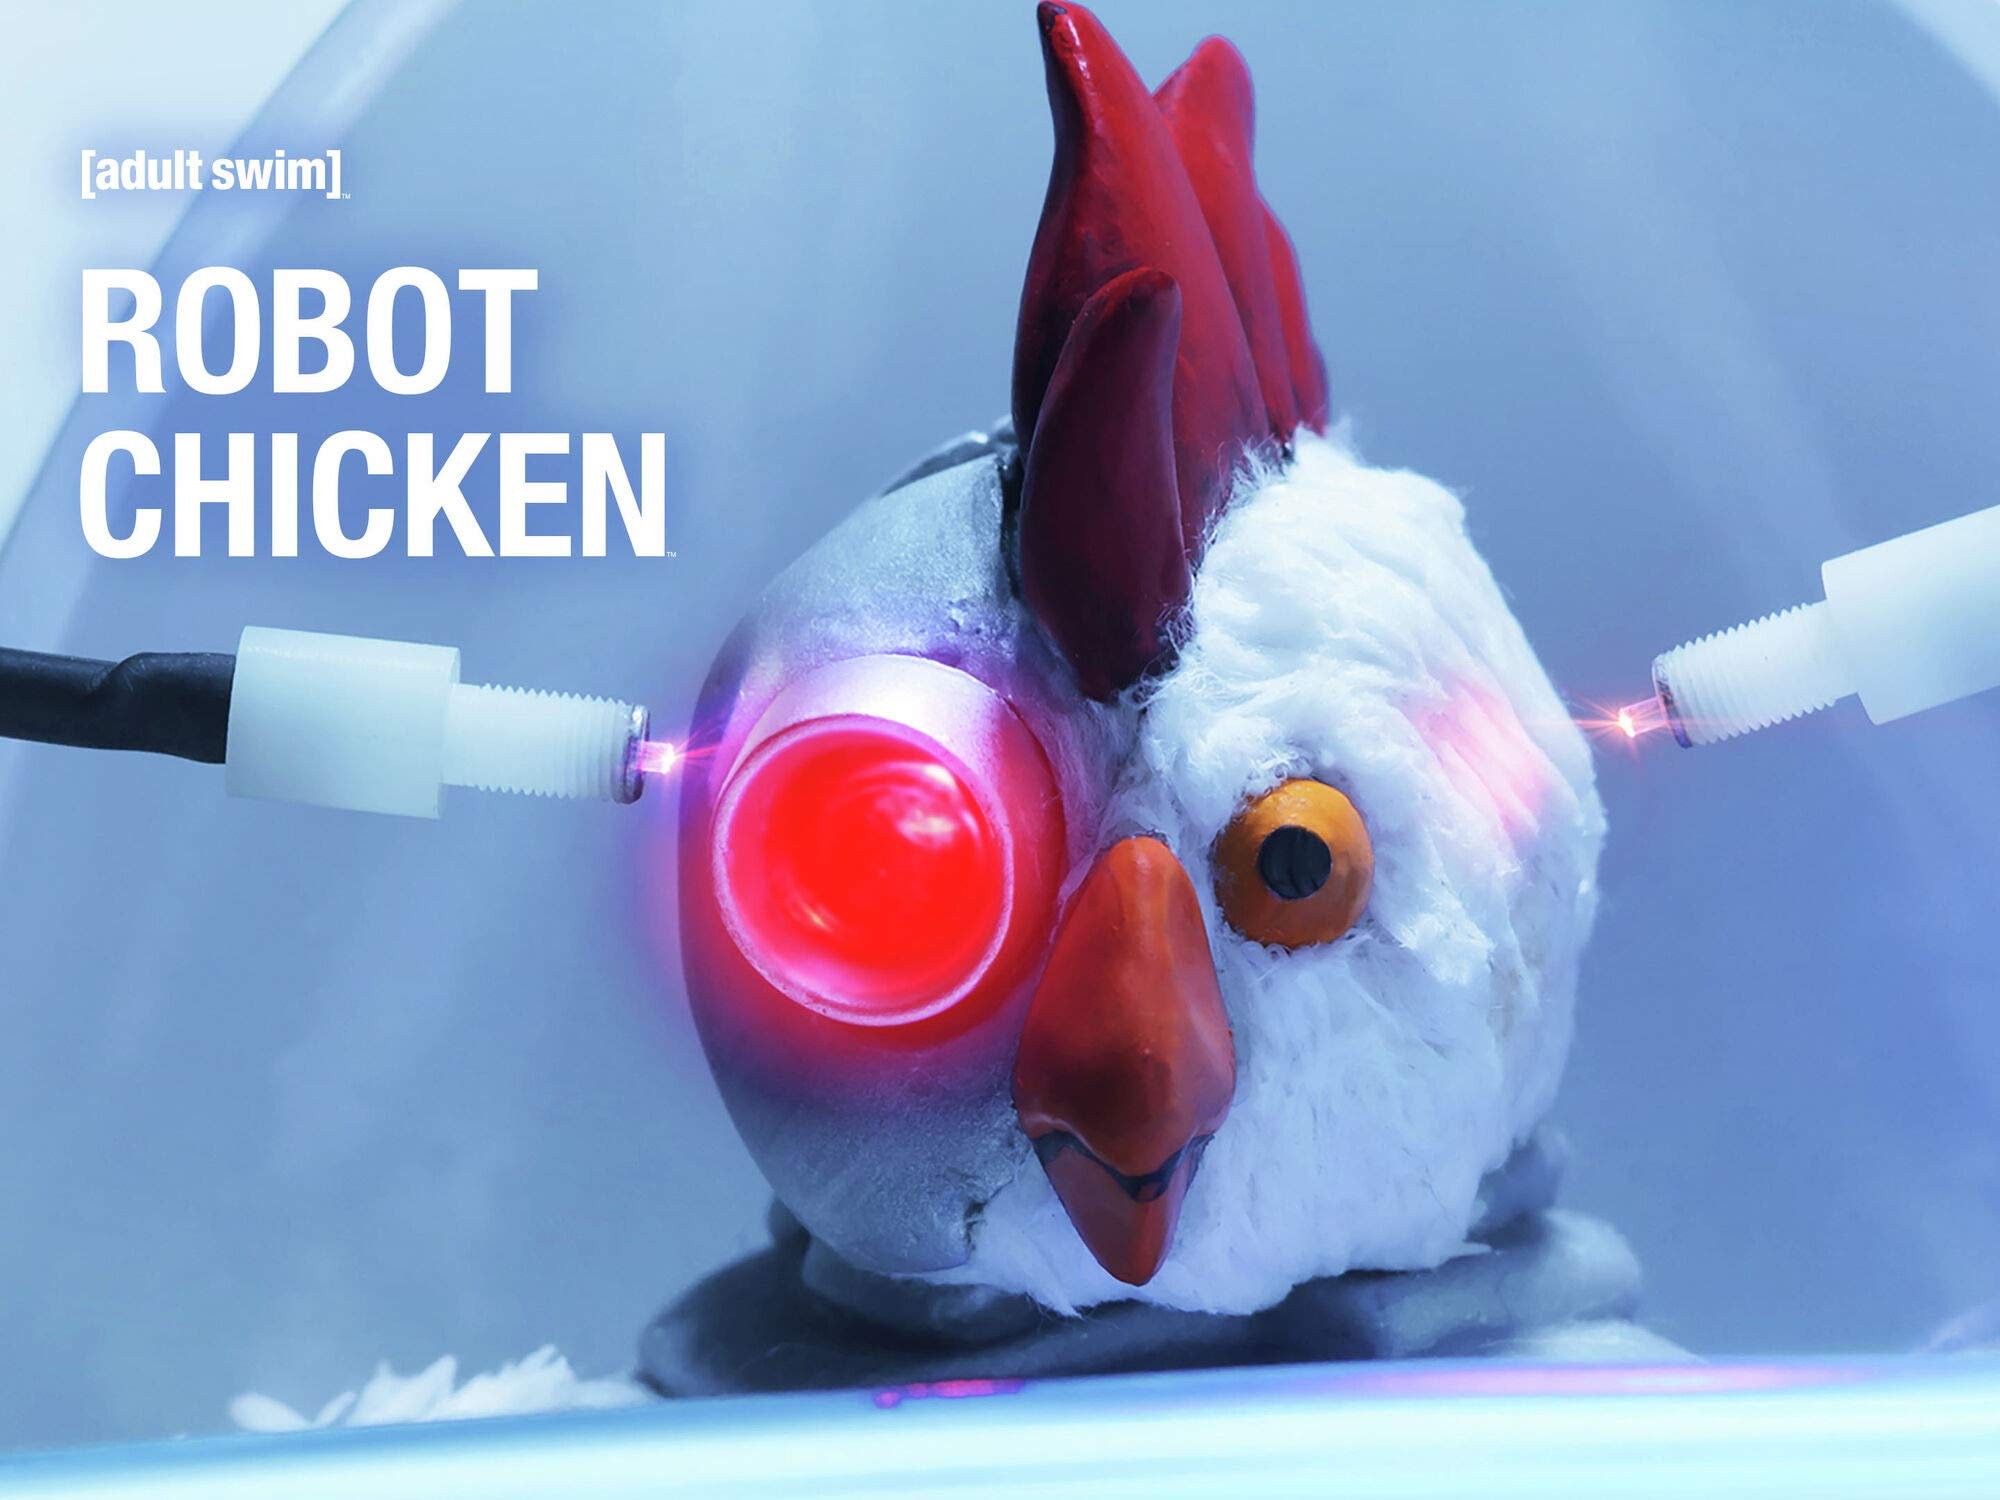 Robot Chicken Season 11 Episode 4